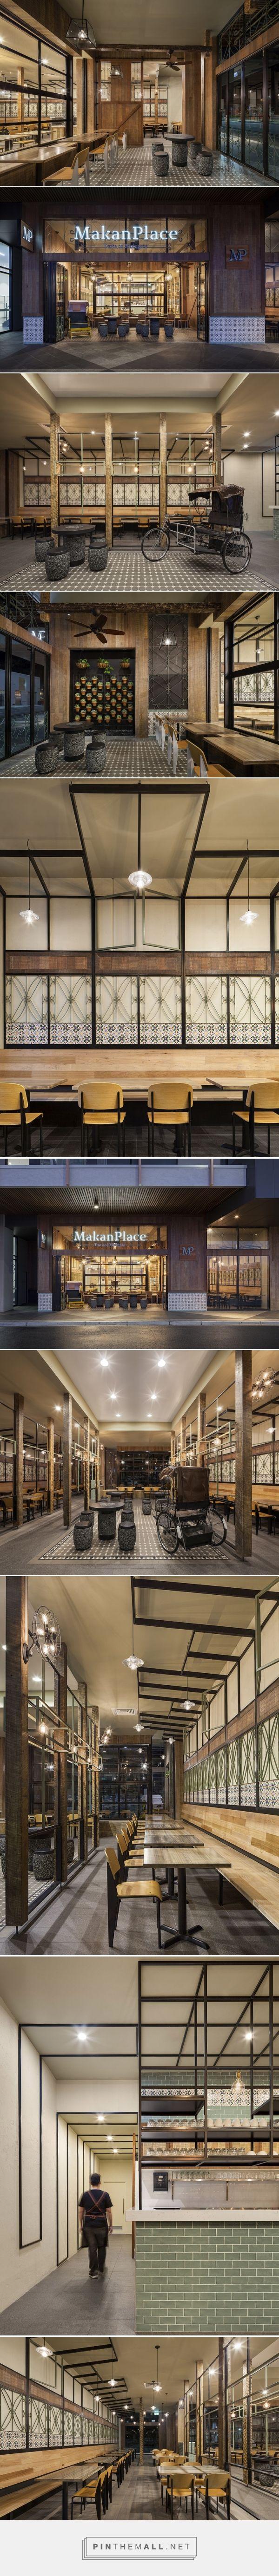 MAKANPLACE Restaurant By PNEUARCH, Werribee U2013 Australia » Retail Design Blog    Created Via Https. Commercial InteriorsRetail Design